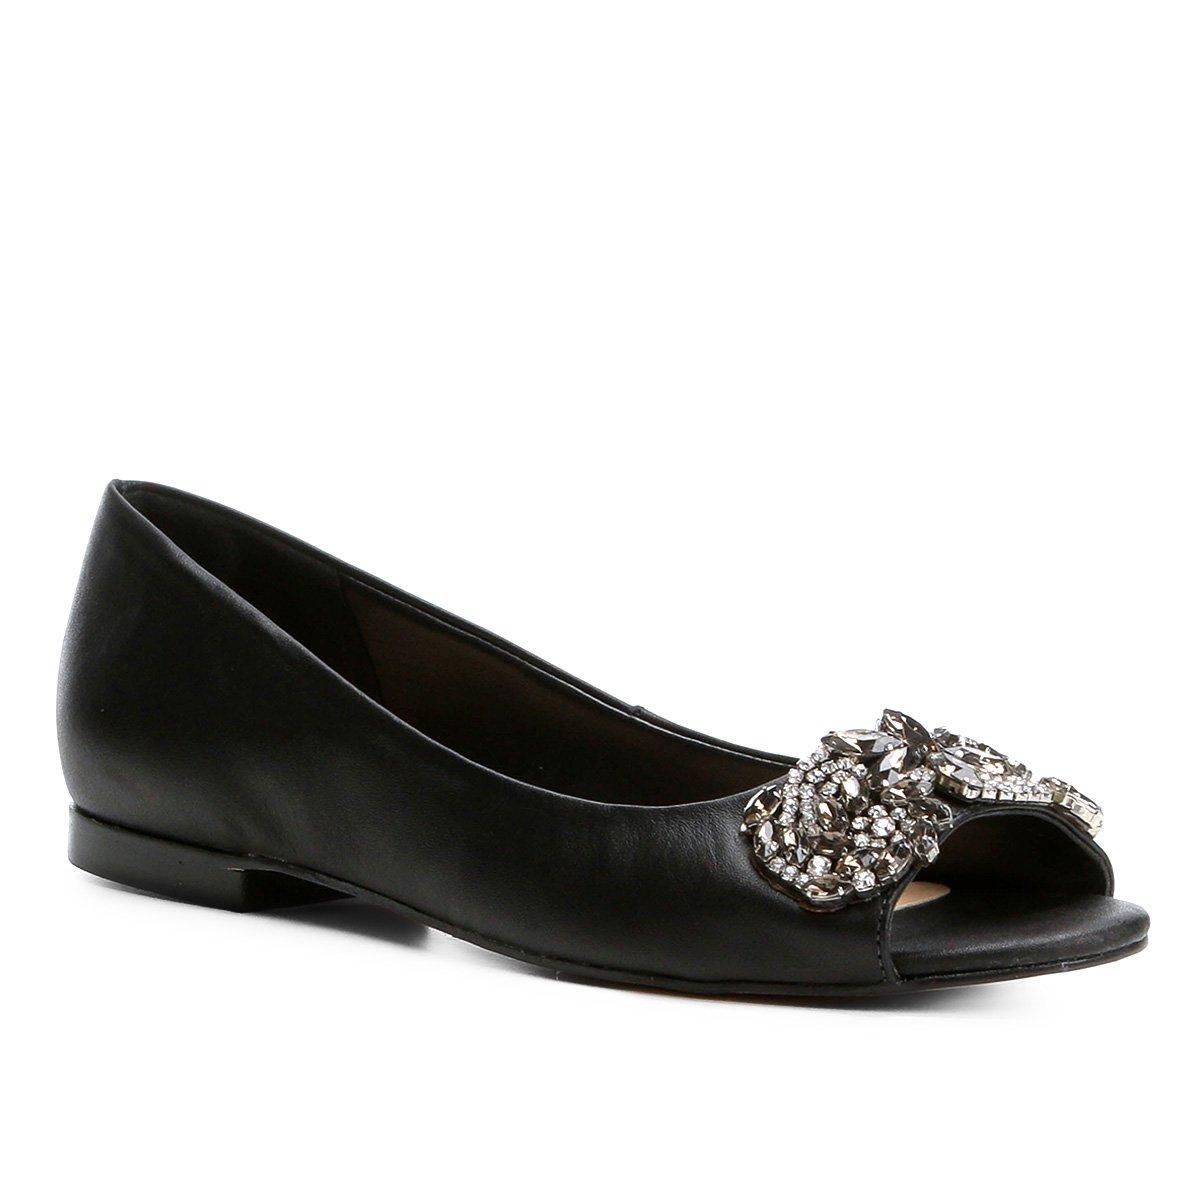 Feminina Shoestock Couro Sapatilha Preto Aberta Sapatilha Couro Pedraria Shoestock TOq0gOZx